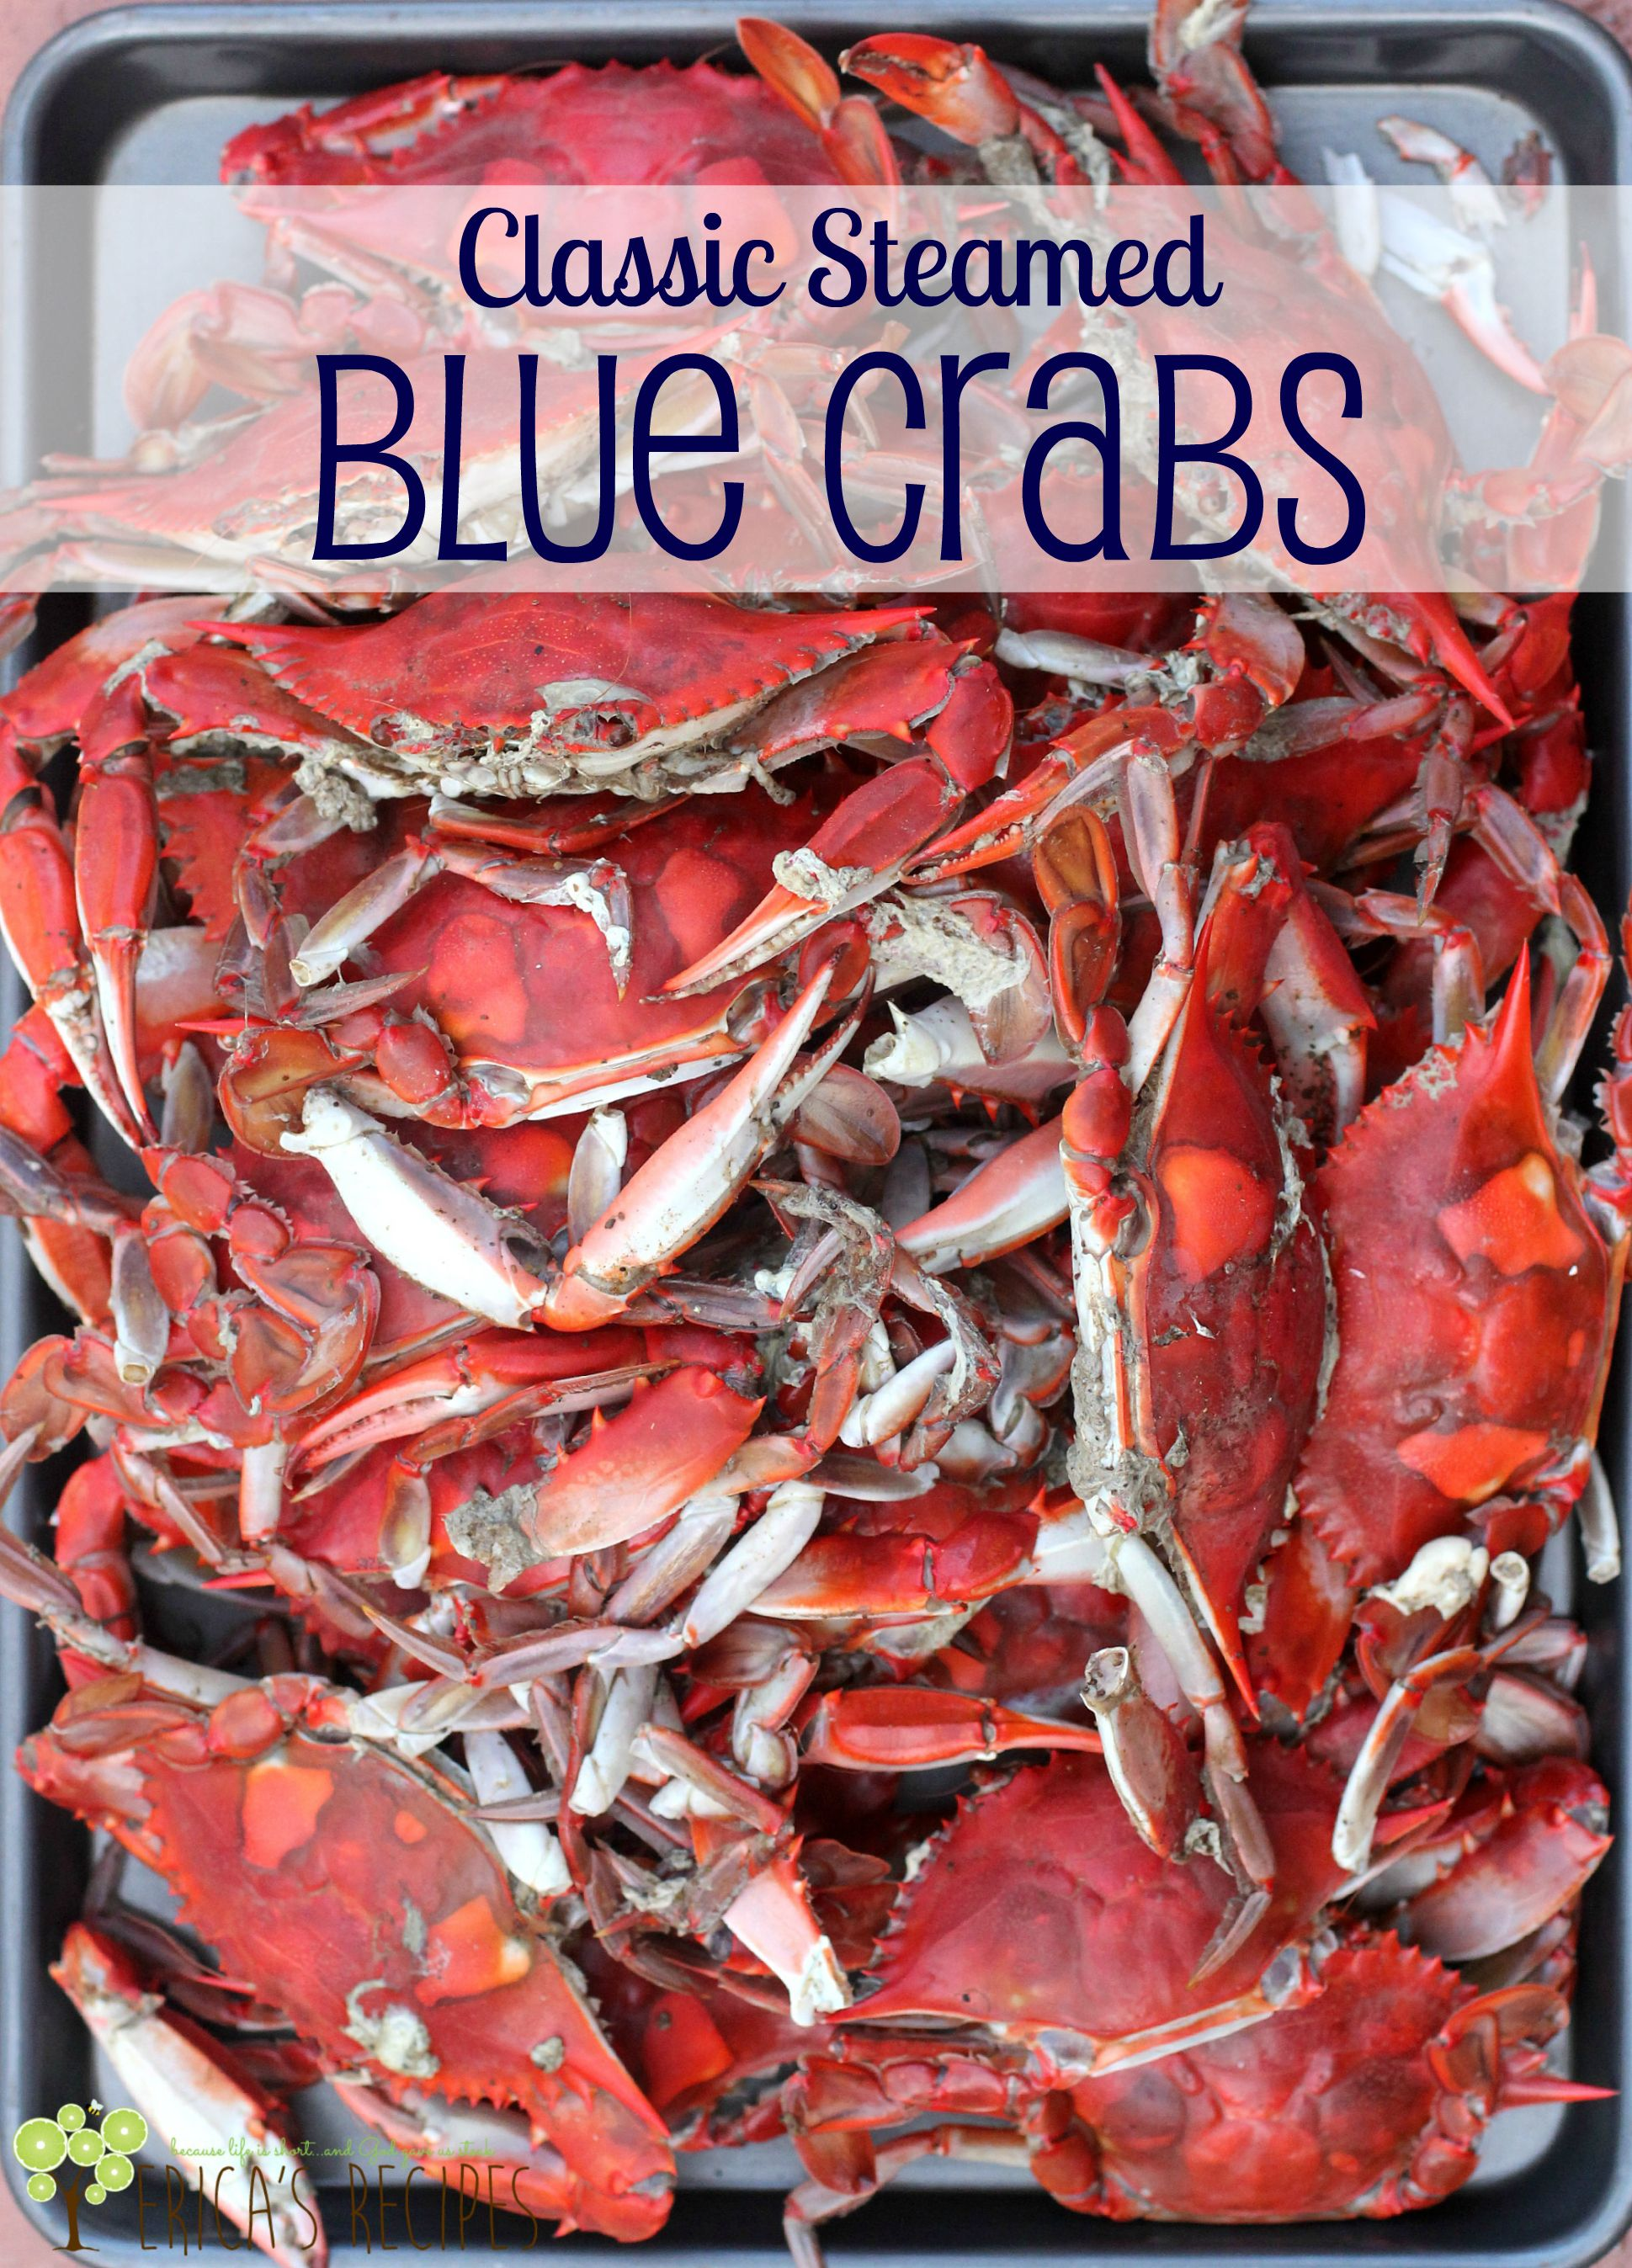 Classic Steamed Blue Crabs Ericasrecipes Com Comida Alimentos Mariscos